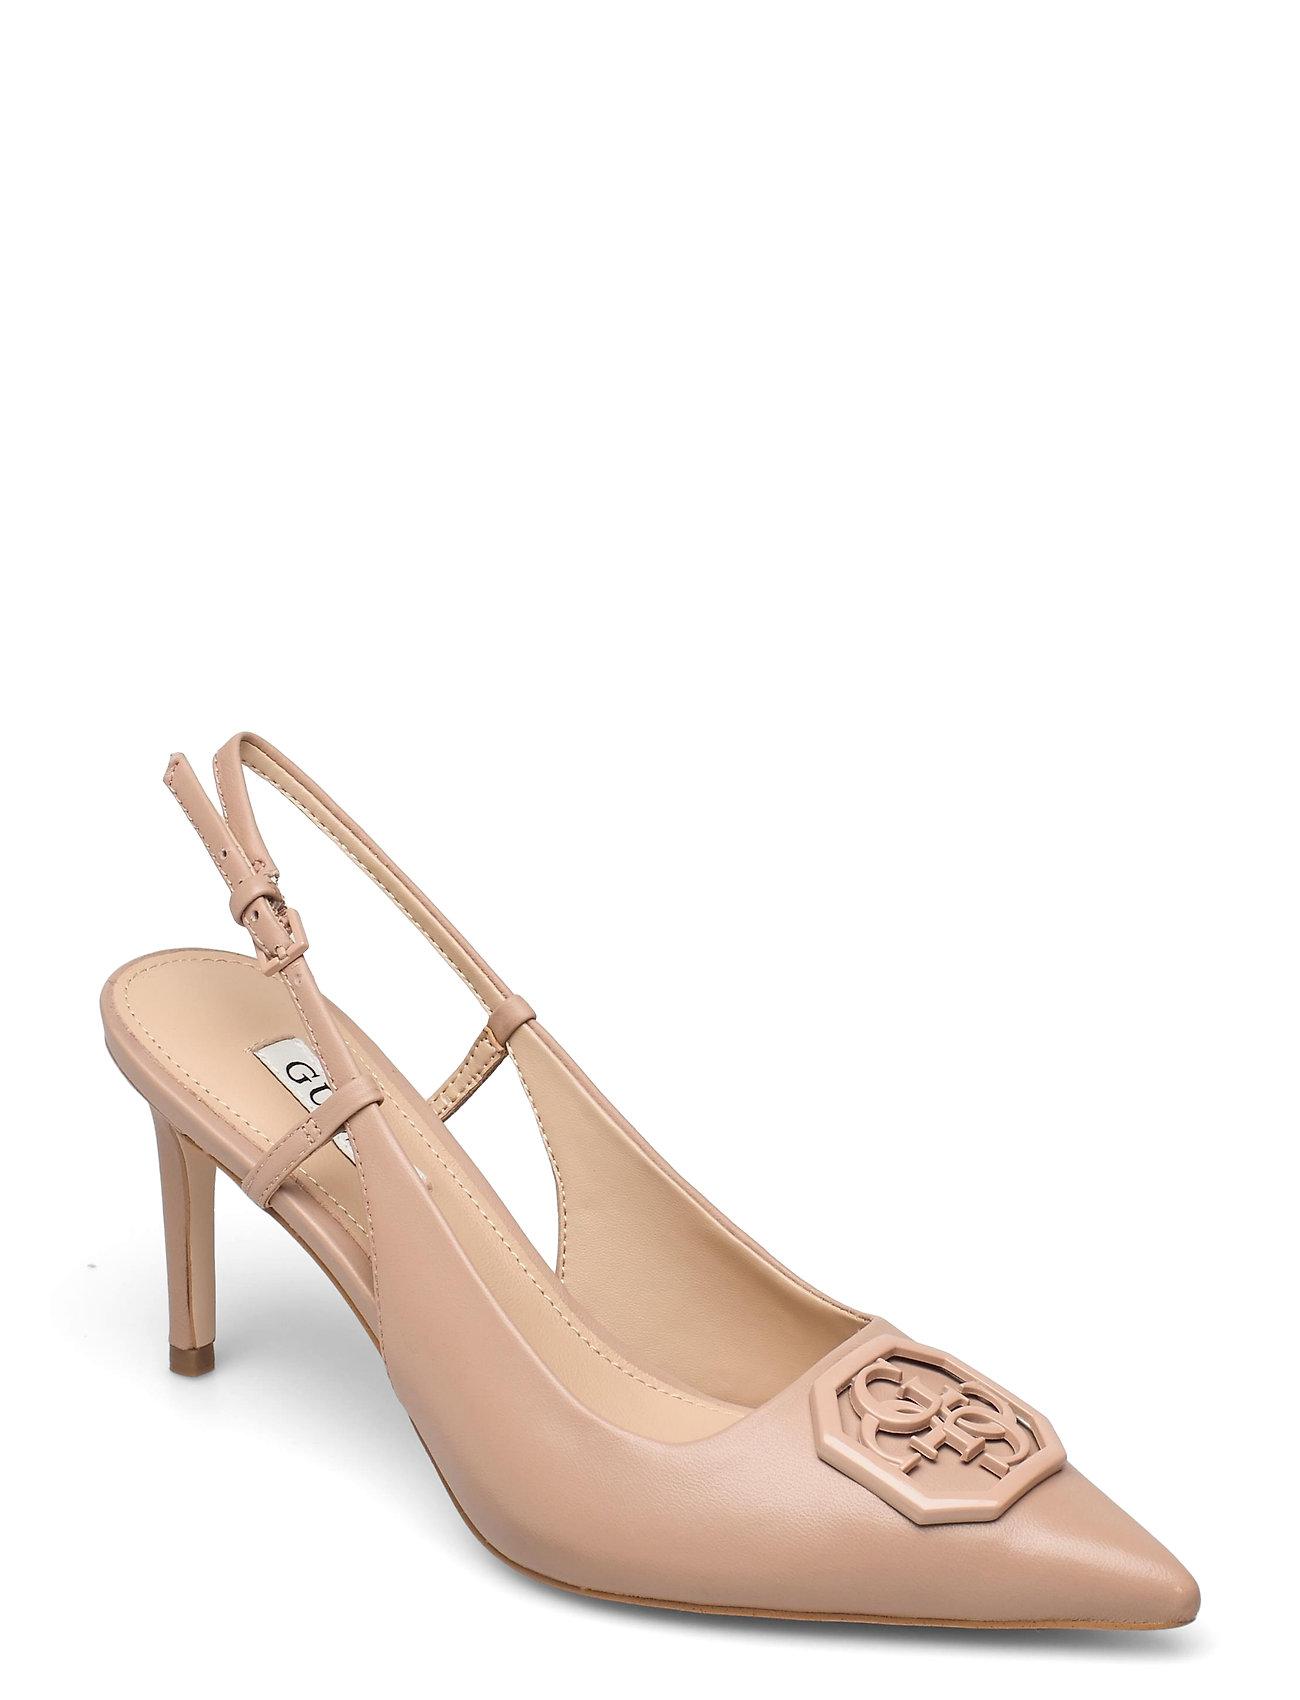 Aleny/Sandalo /Leather Shoes Heels Pumps Sling Backs Lyserød GUESS